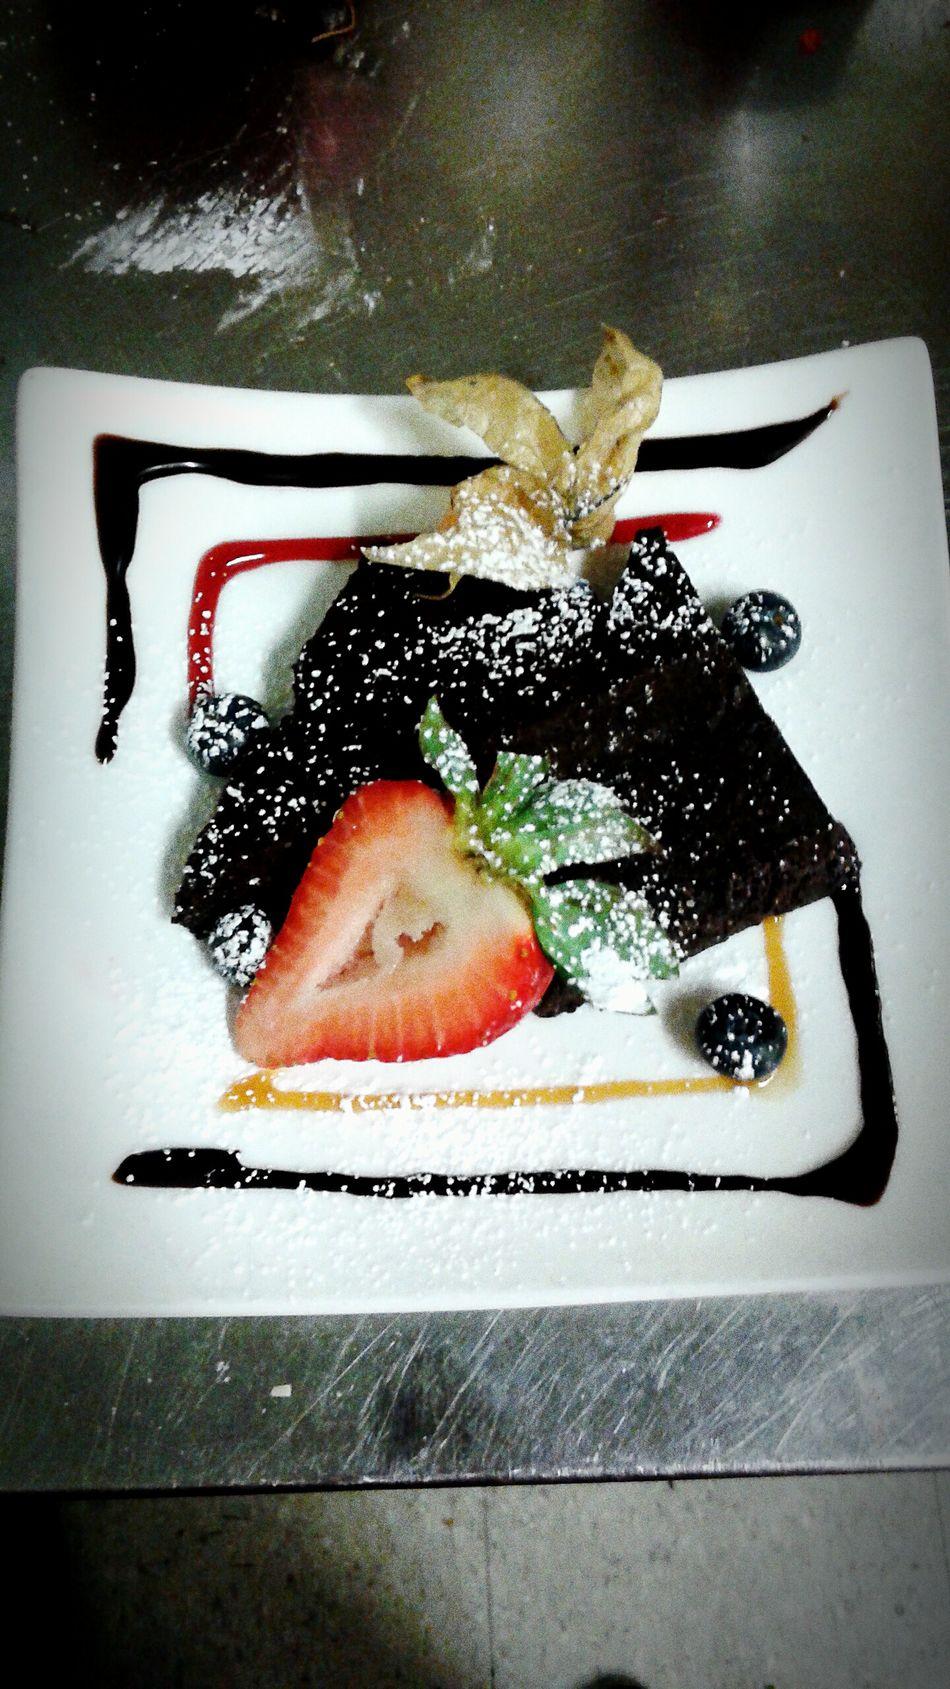 Chocolate♡ Chocolate Torte Dessert Chef Design Strawberry Gooseberry Dessert Plating Yum Sweet Tooth Art